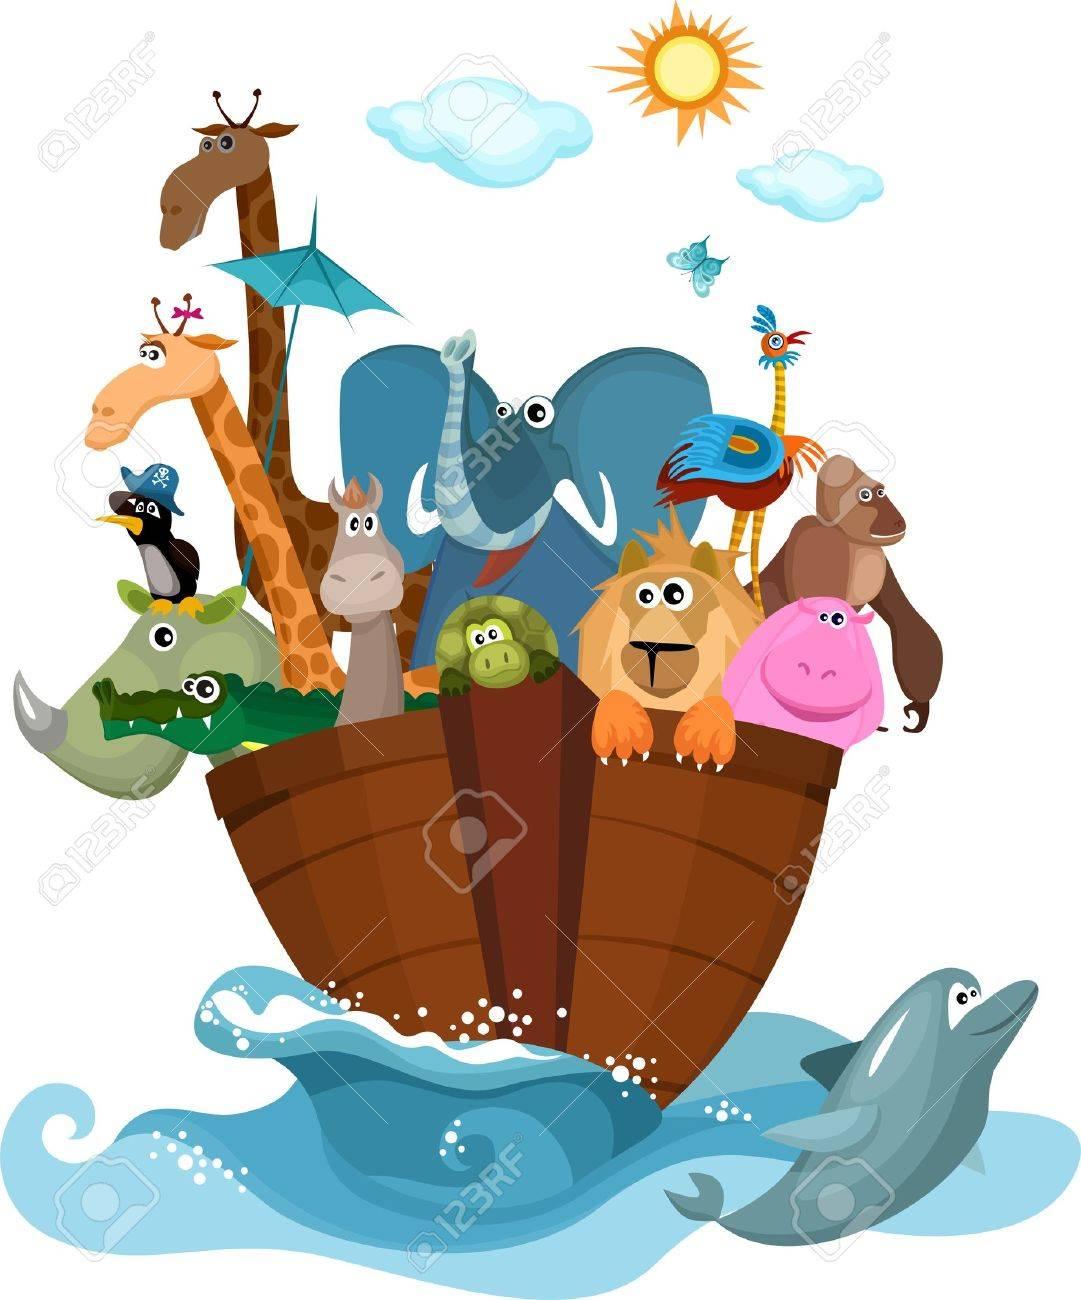 205 noah s ark stock vector illustration and royalty free noah s